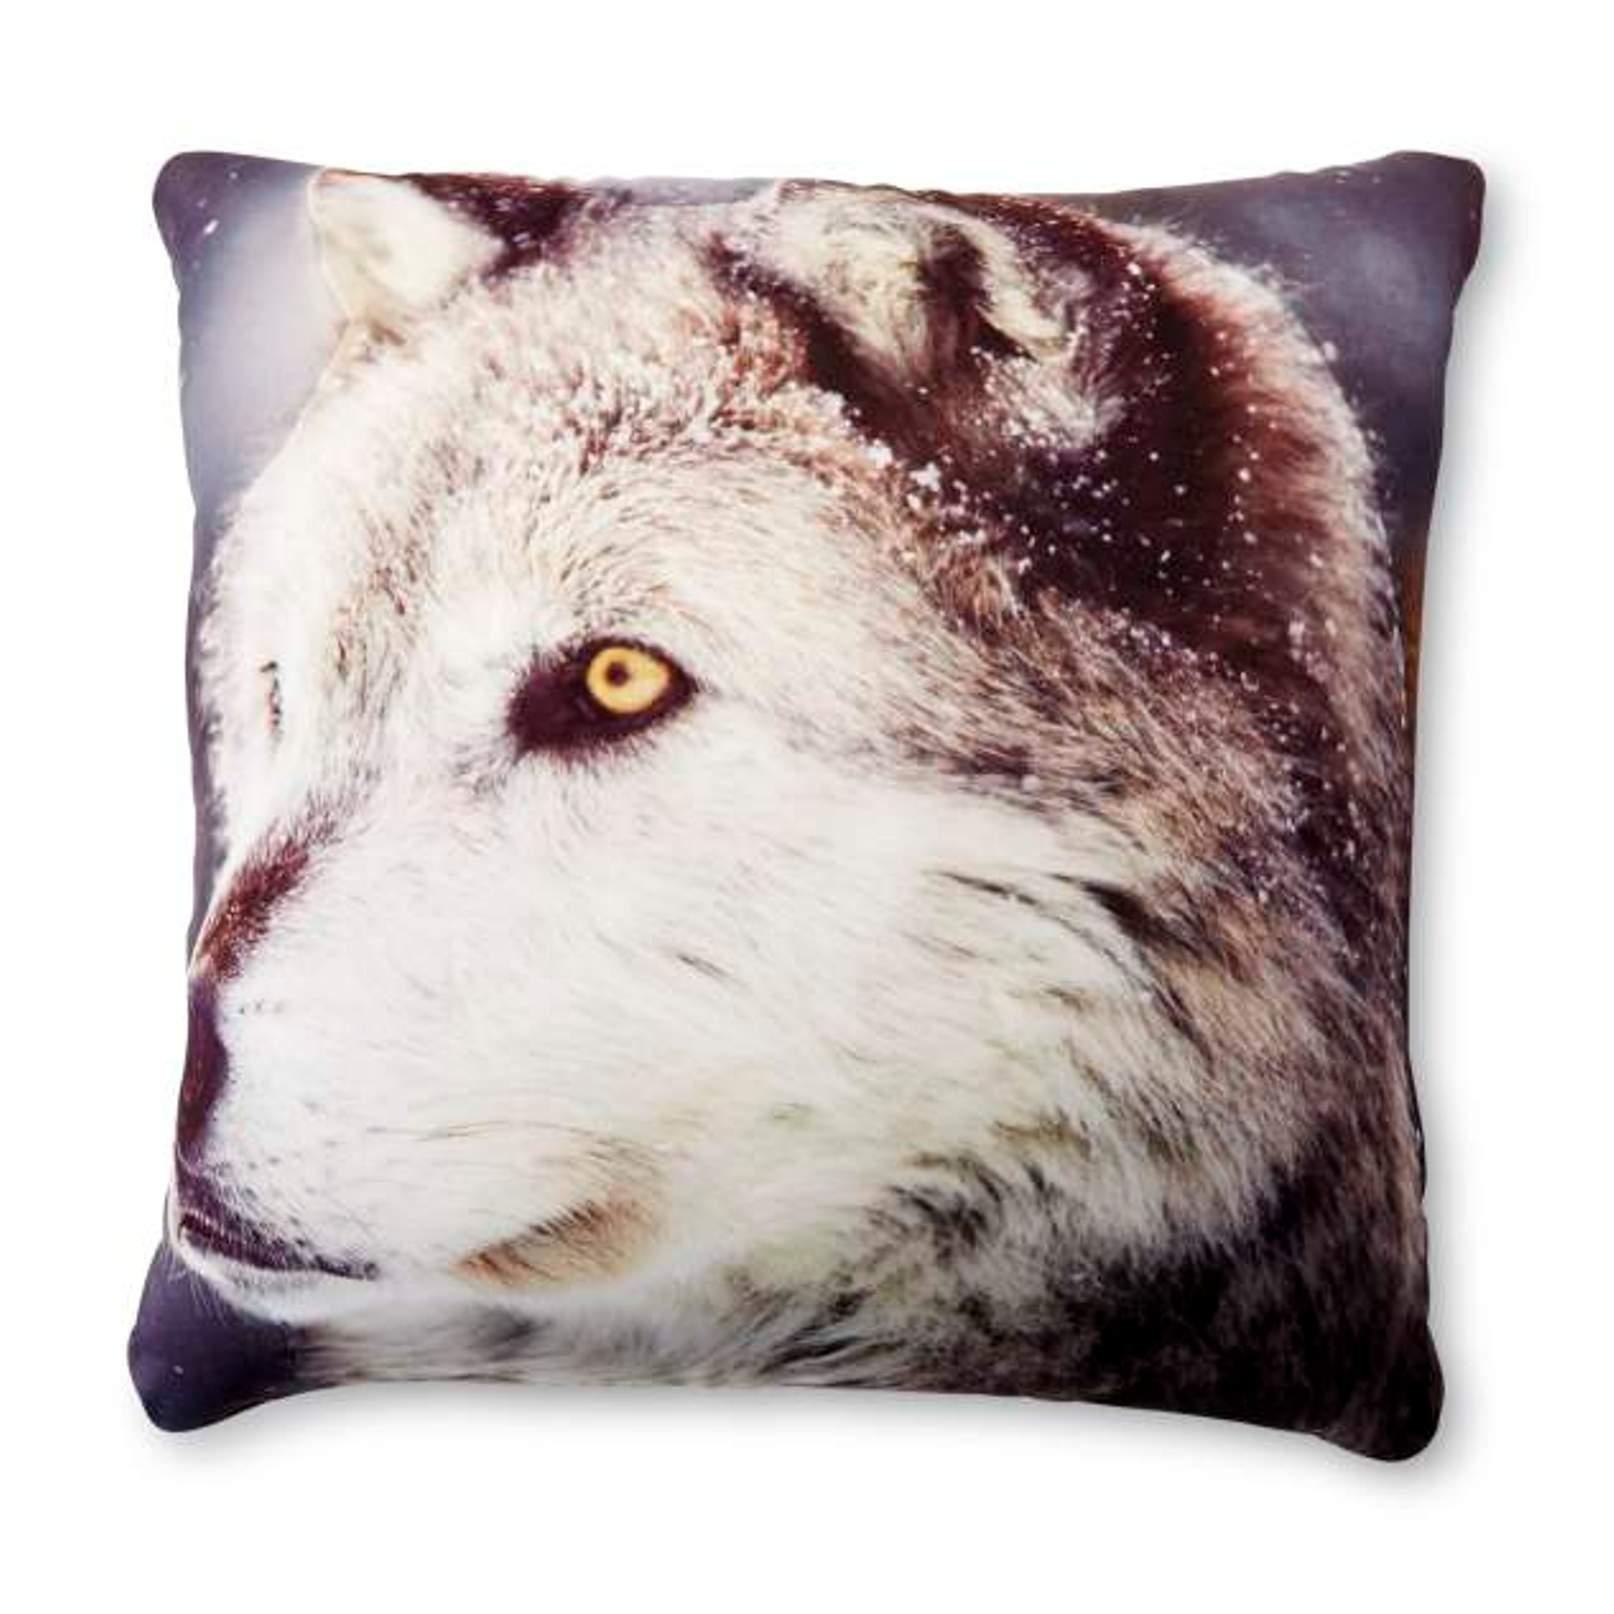 Foam Microbead Pillow - Wolf